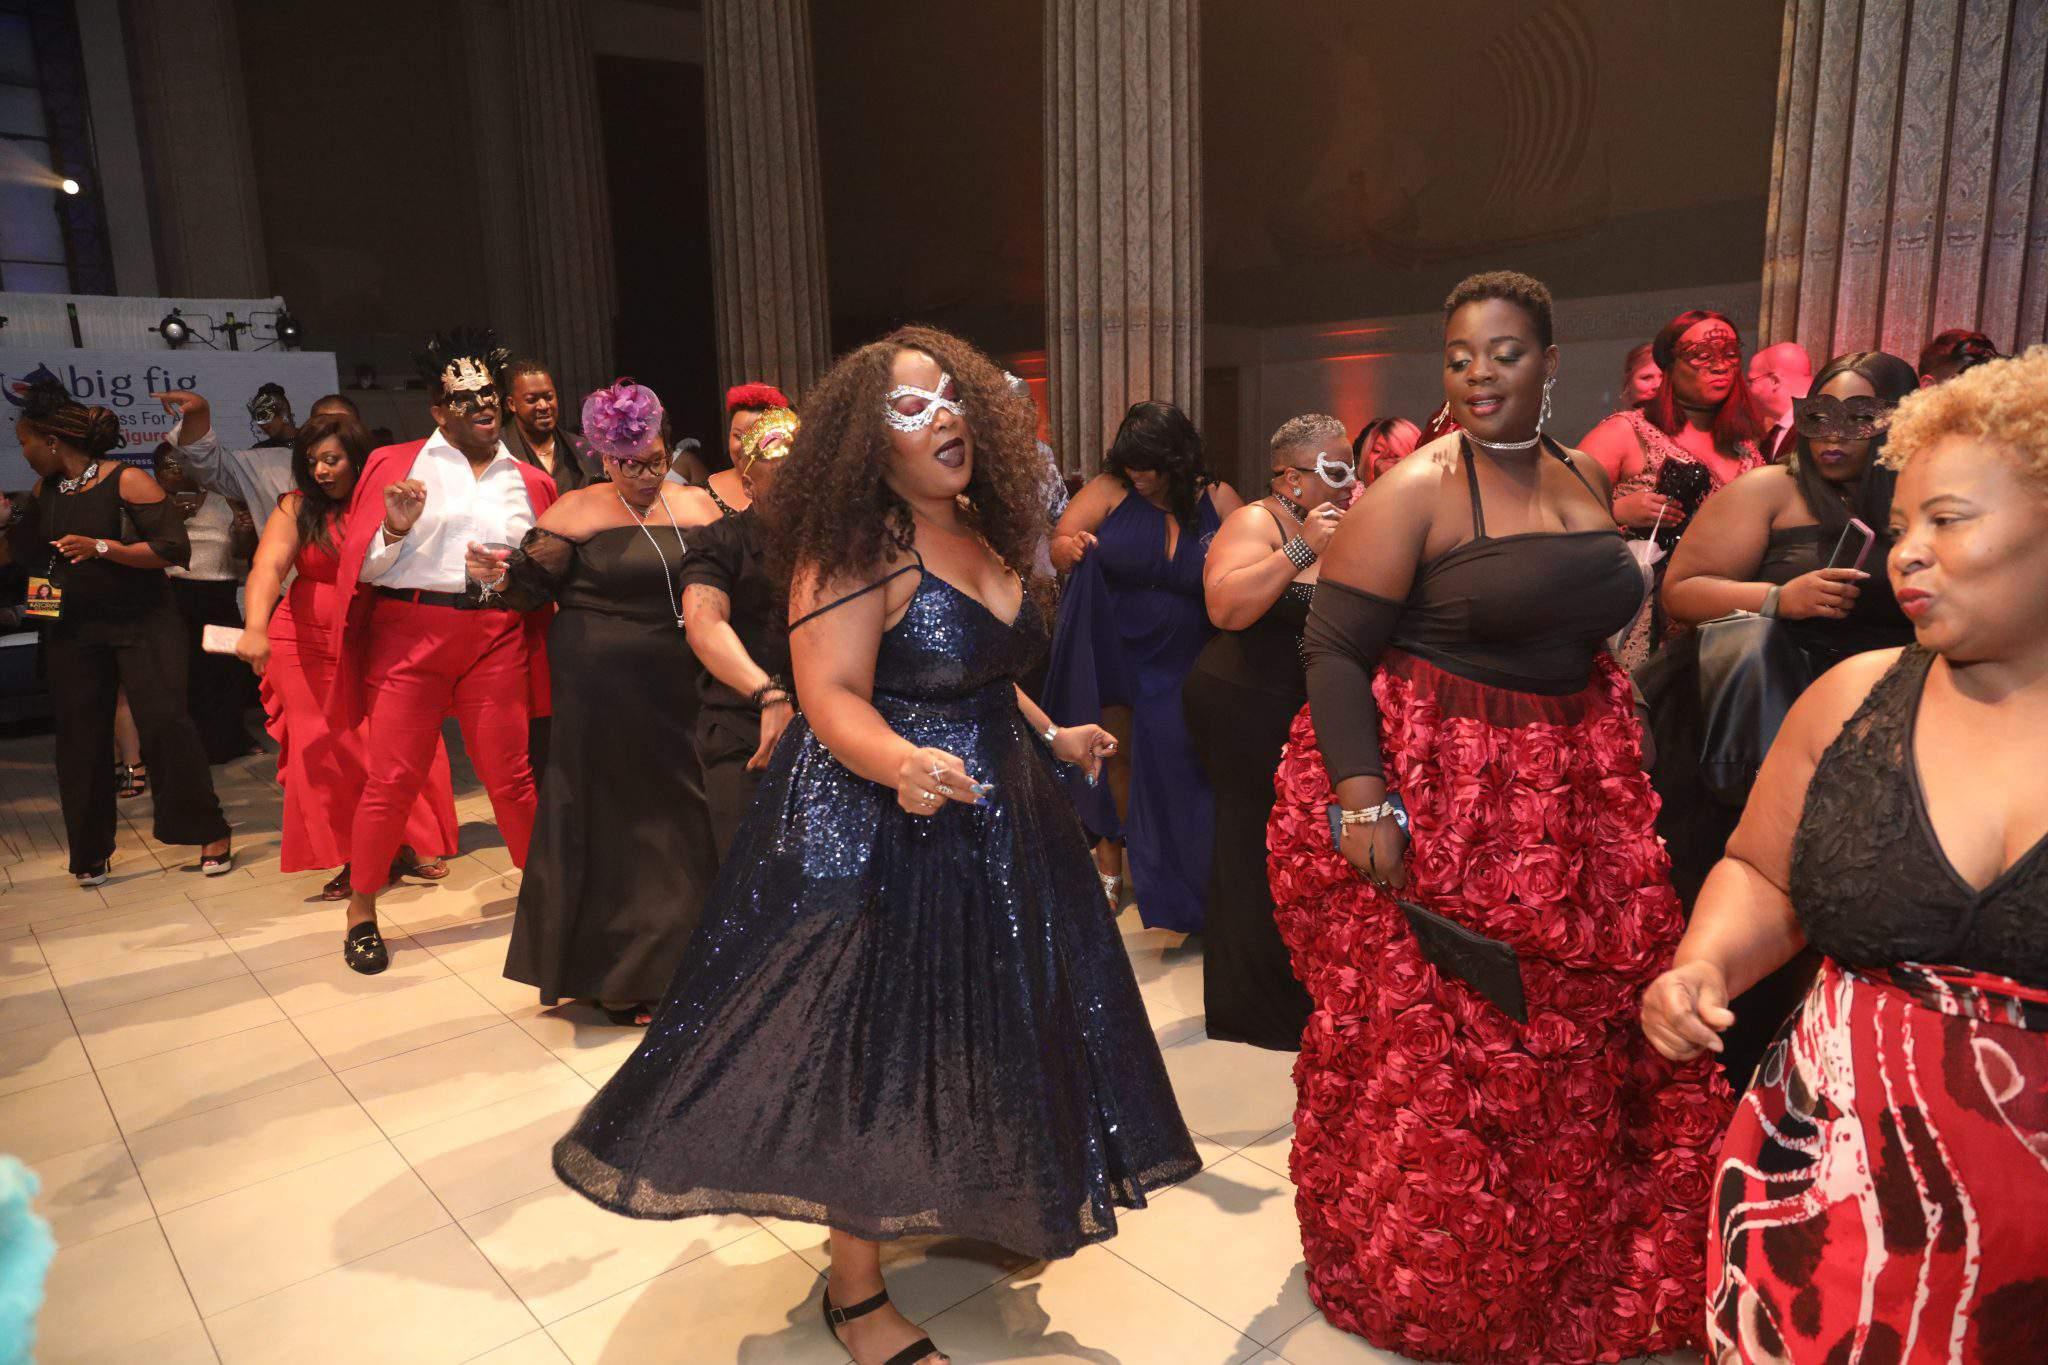 The Masquerade Ball at Full Figured Fashion Week